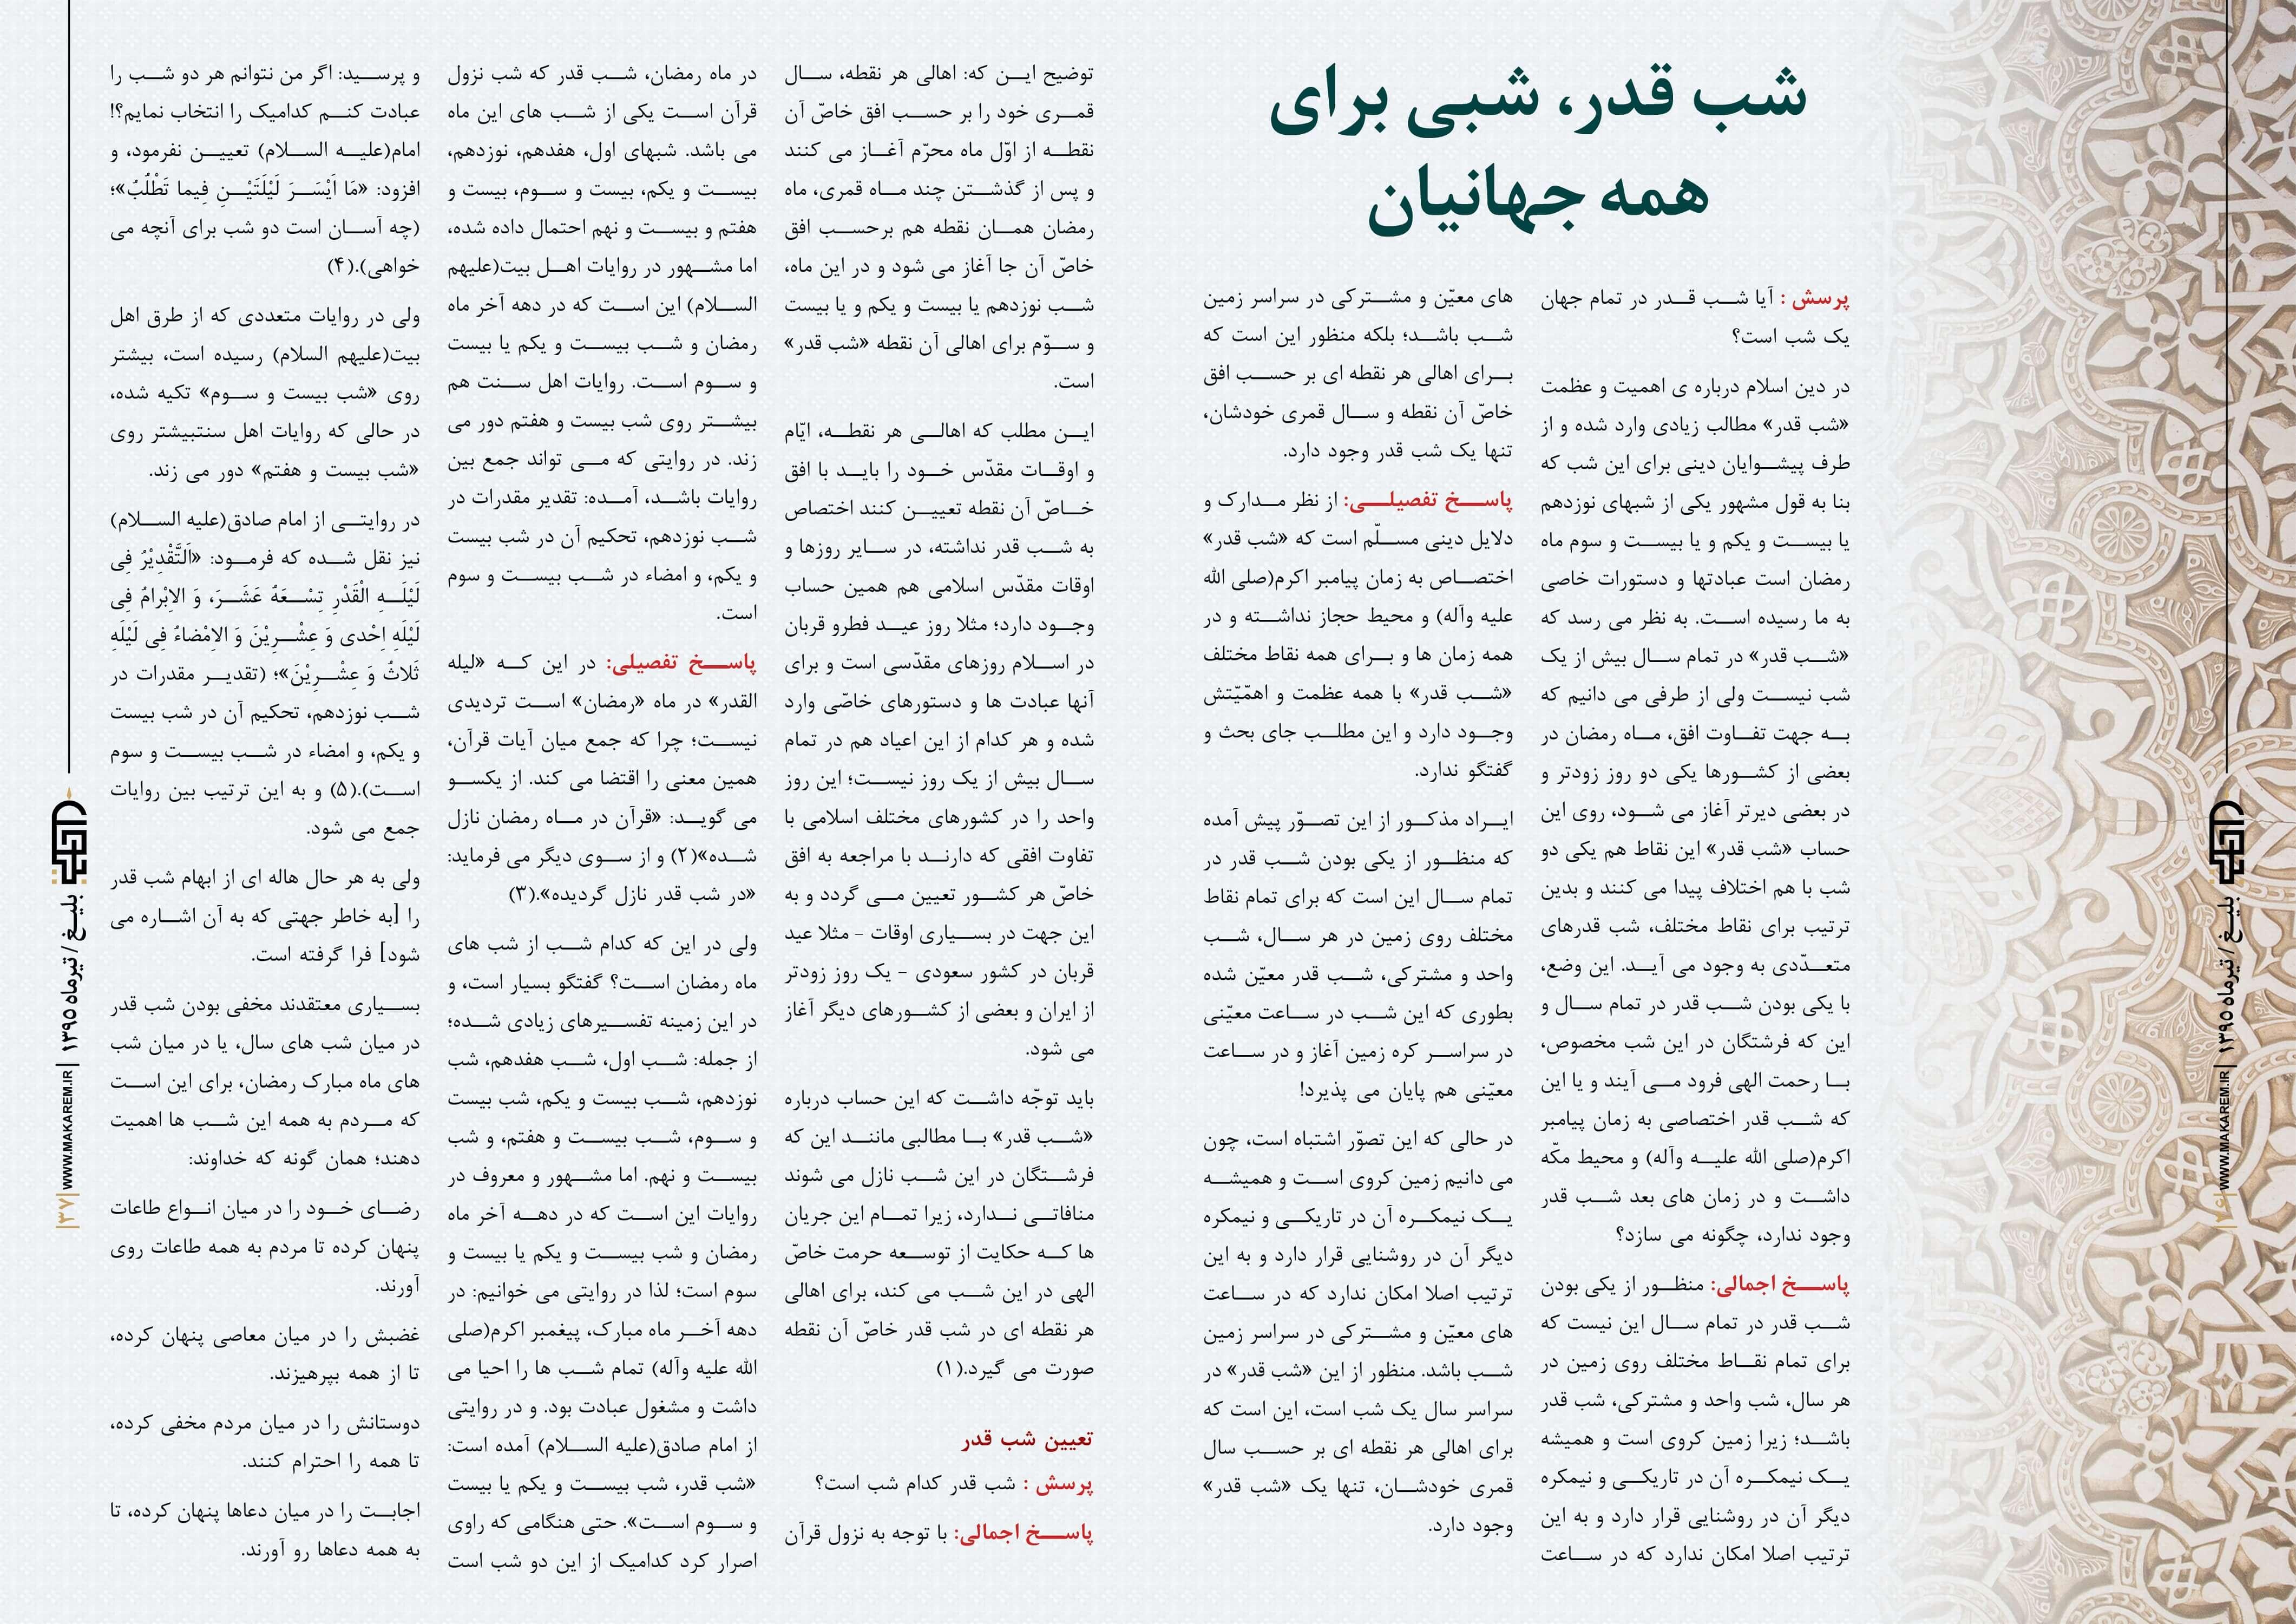 بلیغ 19-مدرسه الامام امیر المومنین (ع)